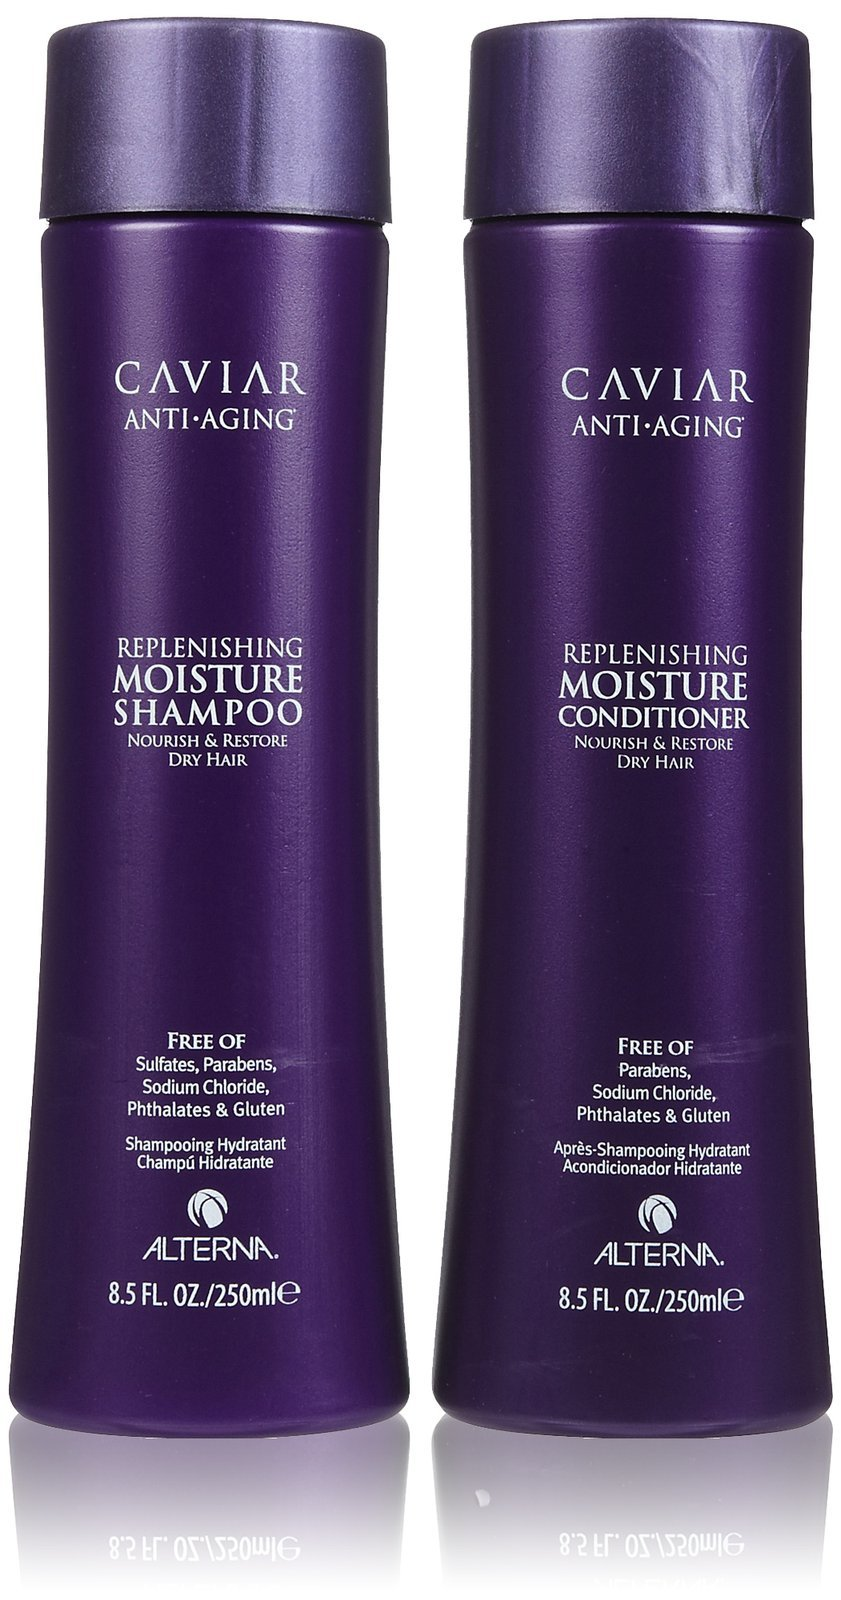 Alterna Caviar Anti-Aging Seasilk Moisture Shampoo & Conditioner Duo